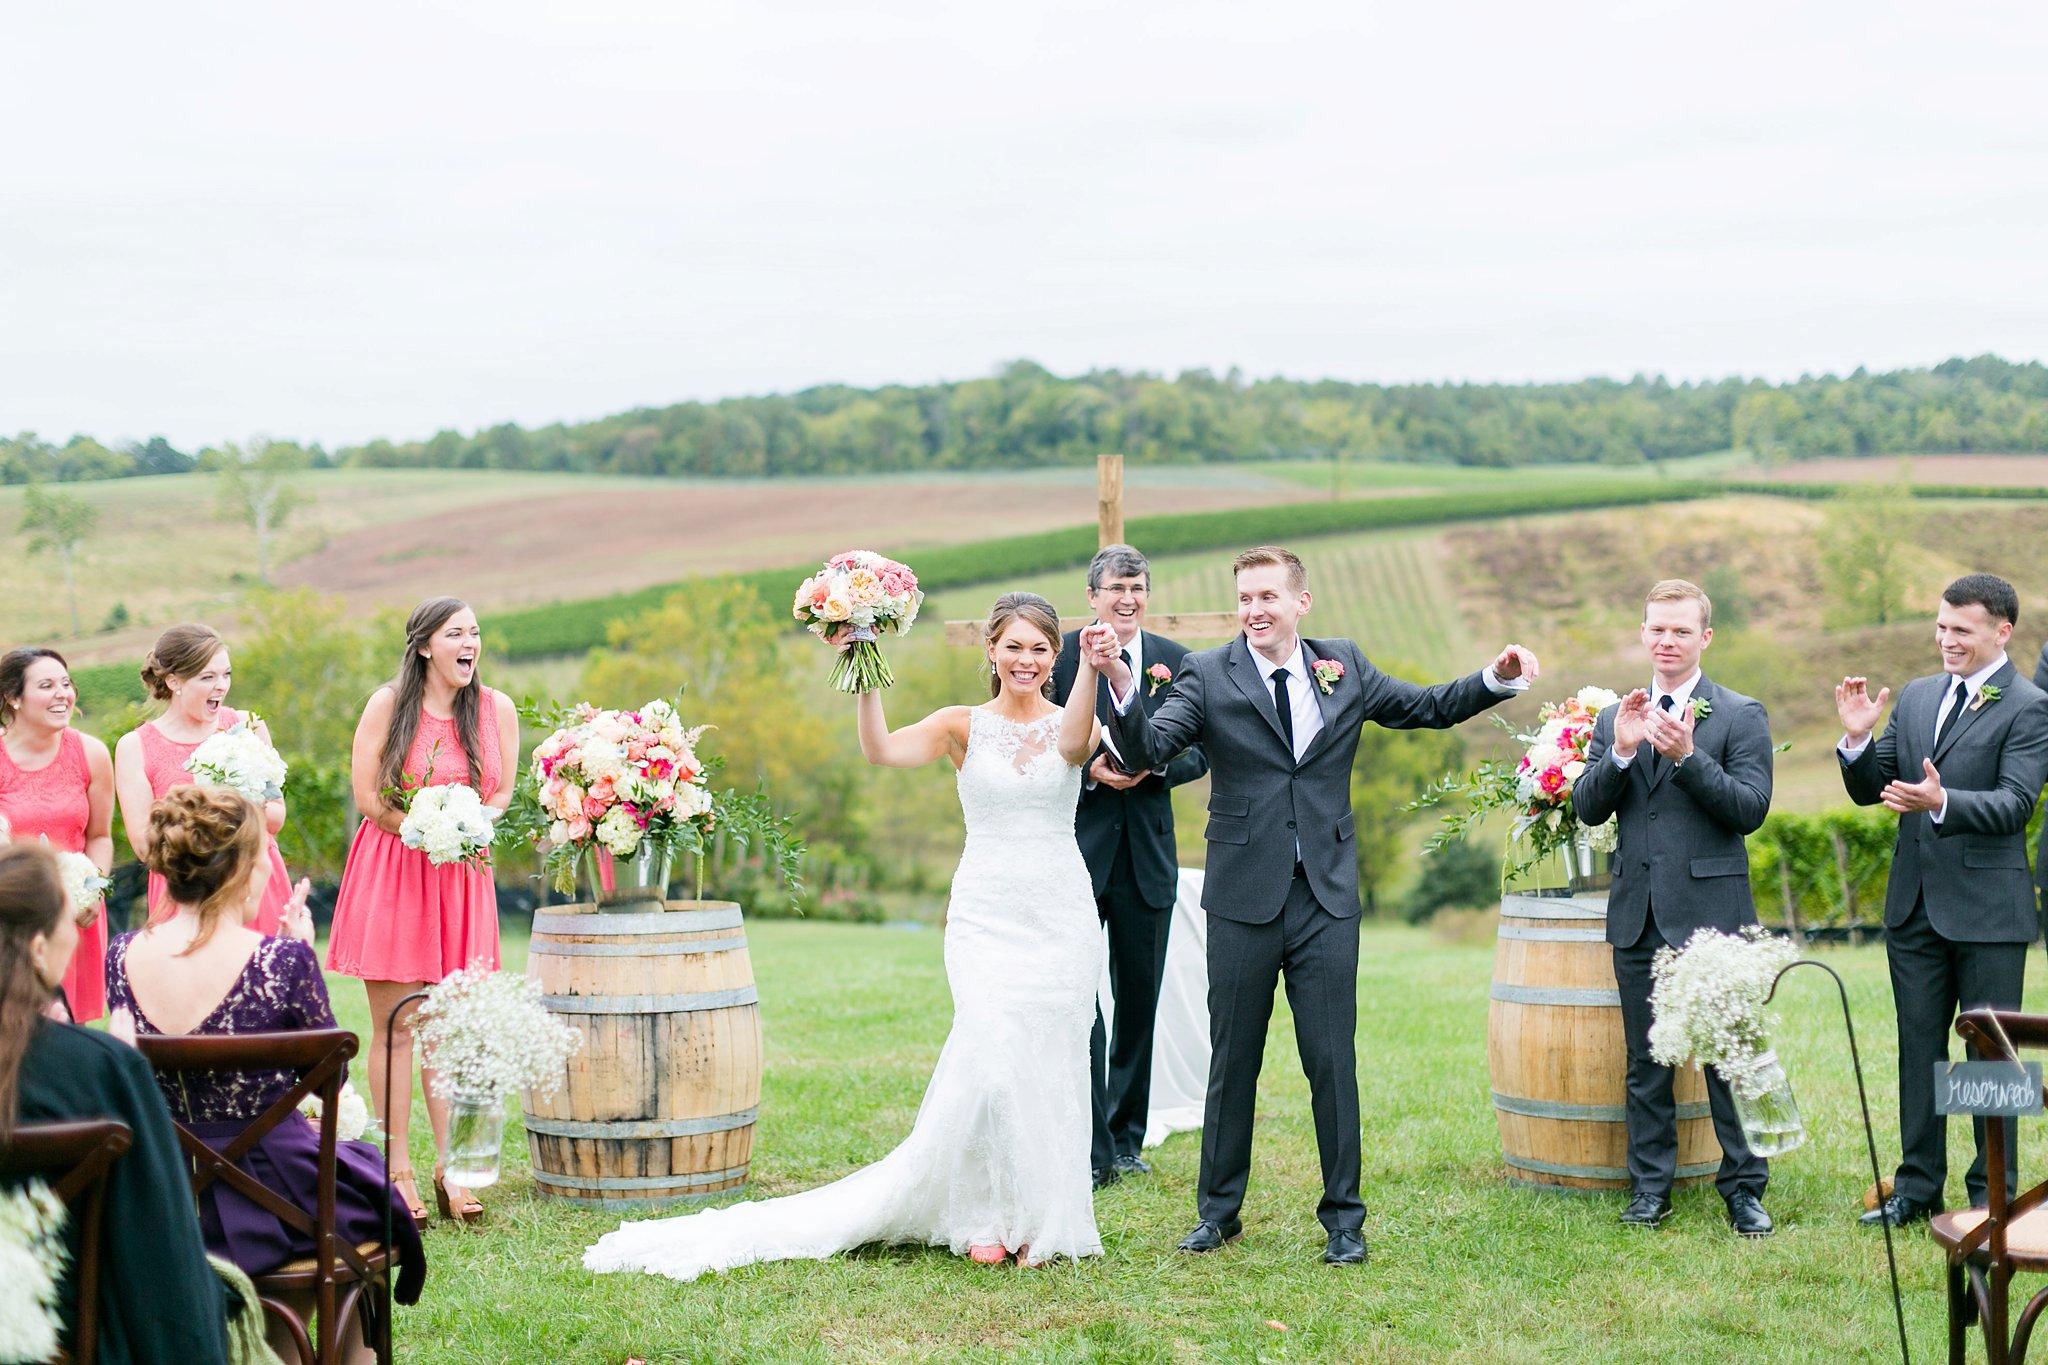 Stone Tower Winery Wedding Photos Virginia Wedding Photographer Megan Kelsey Photography Sam & Angela-164.jpg